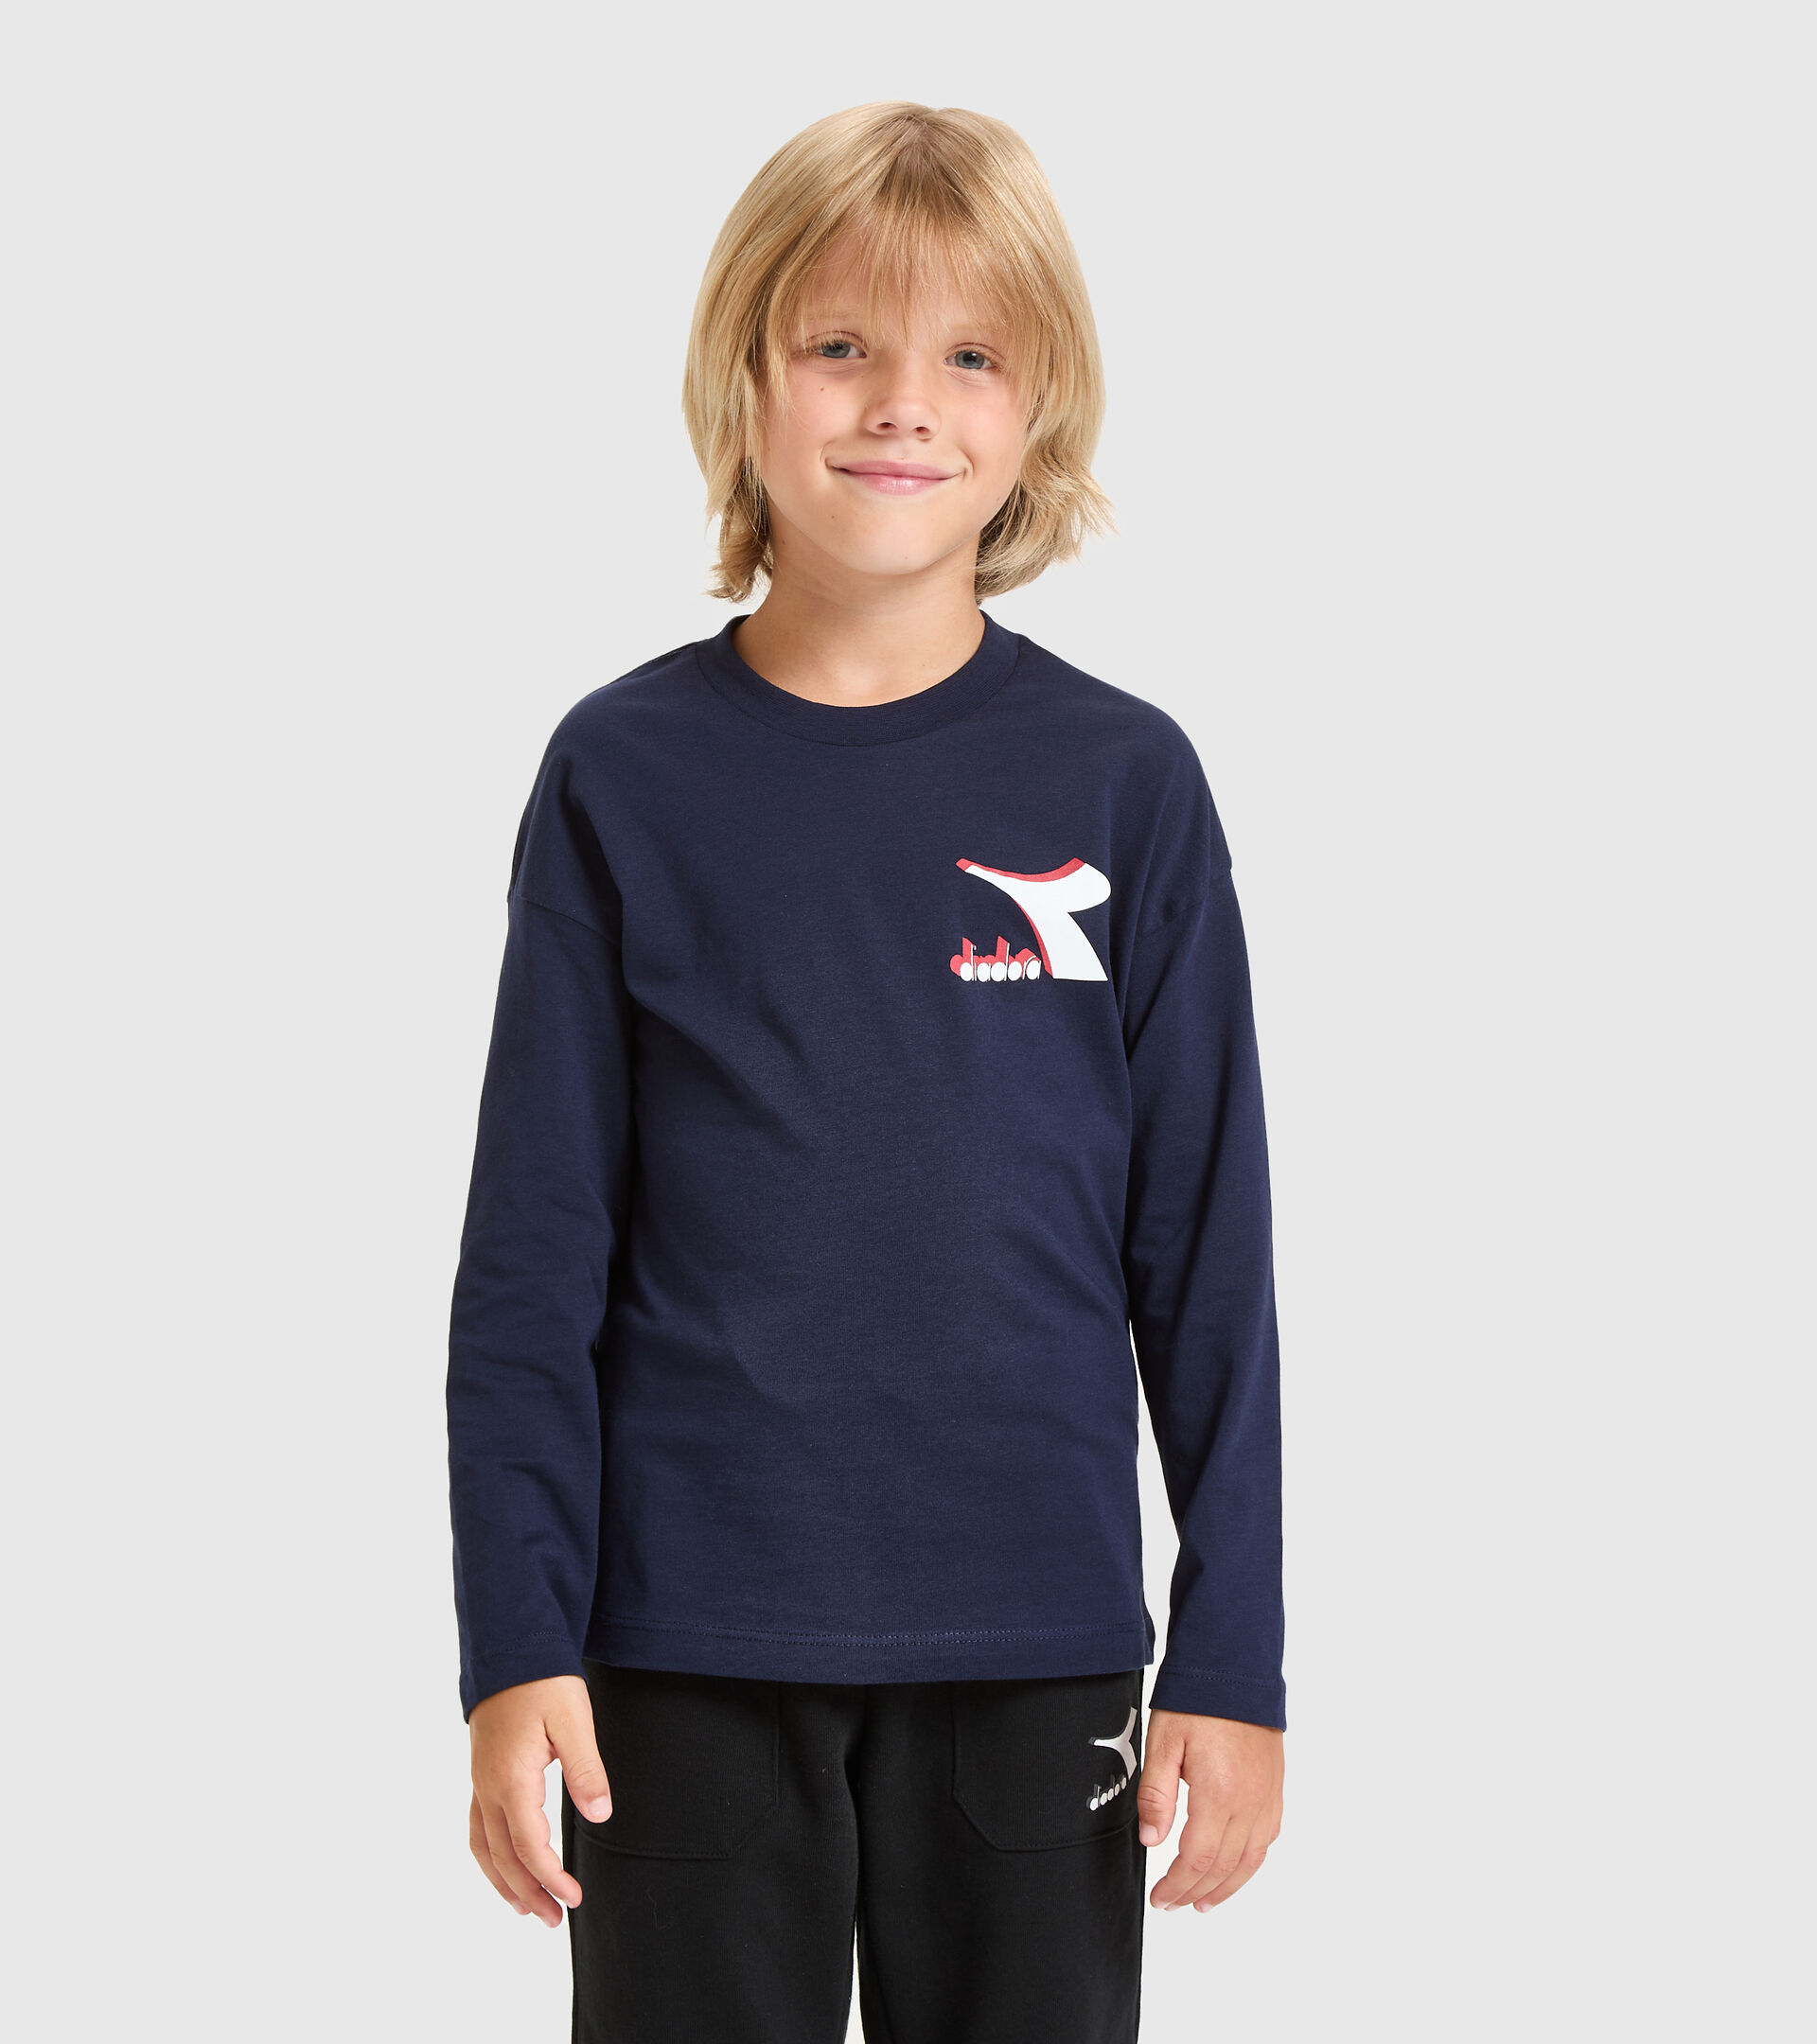 T-Shirt - Kinder JU.LS T-SHIRT CUBIC CABAN BLAU - Diadora